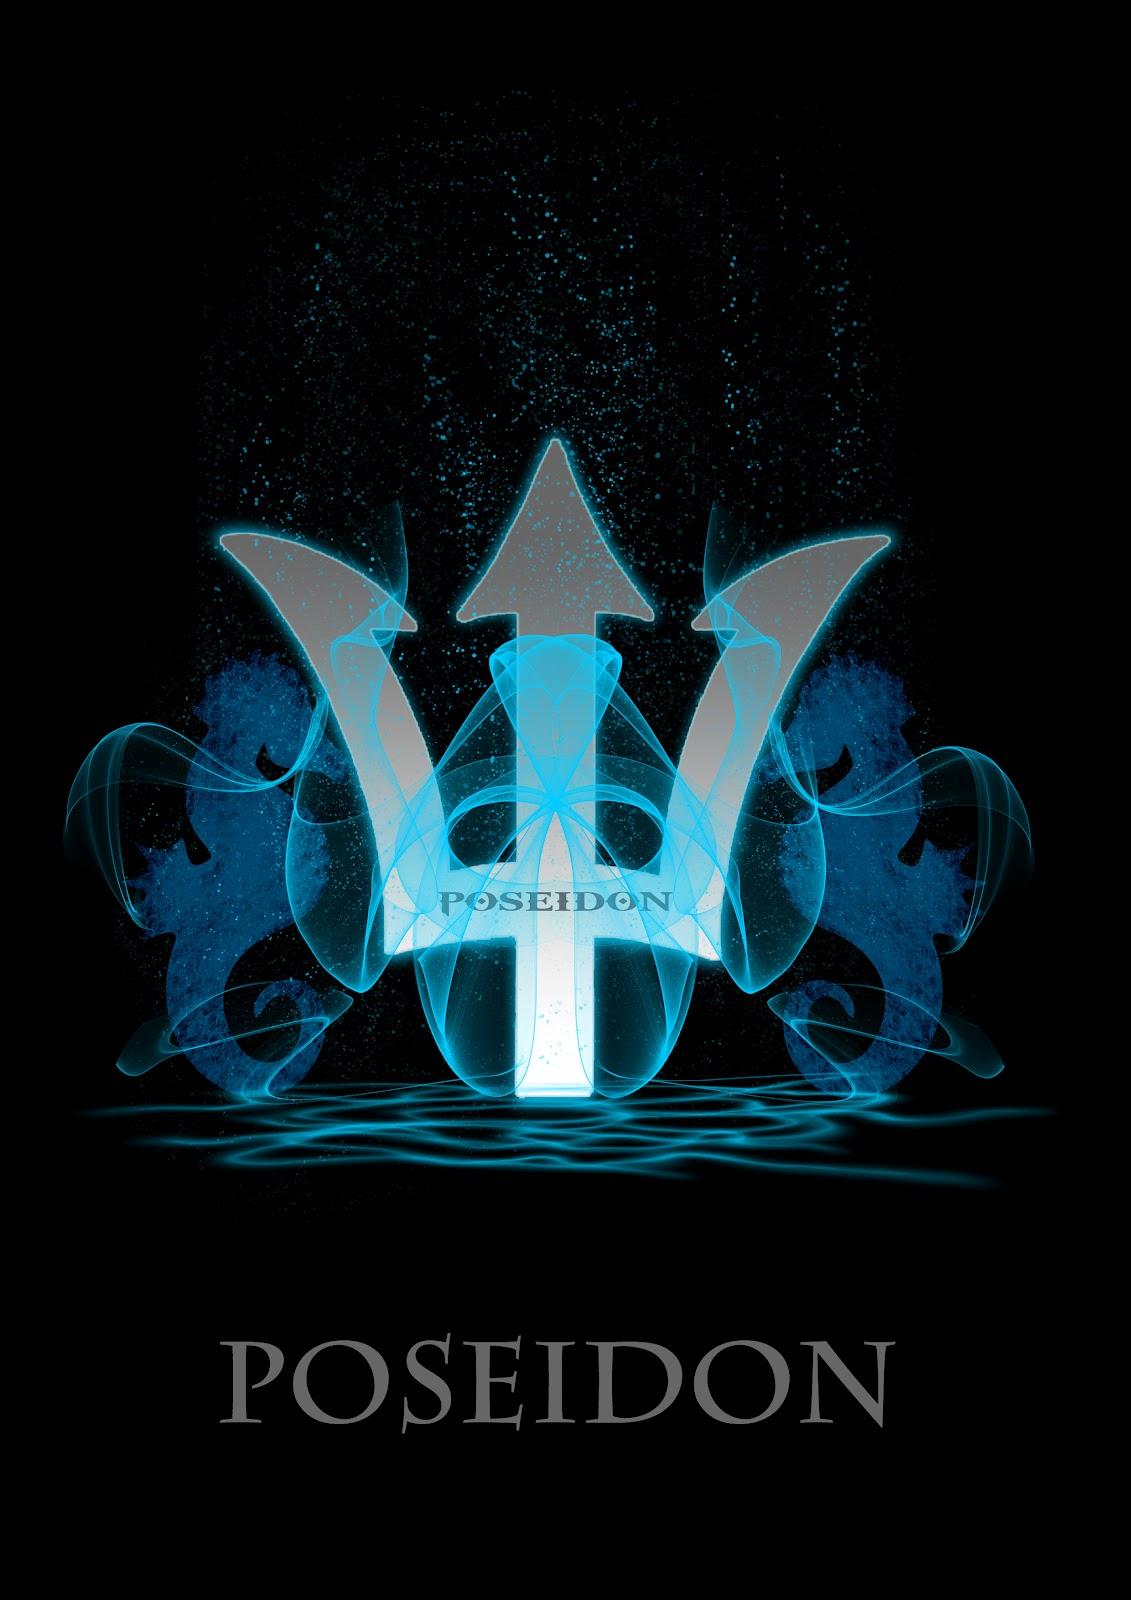 Poseidon symbol | + Percy Jackson + | Pinterest | Percy ...  |Poseidon Percy Jackson Symbol